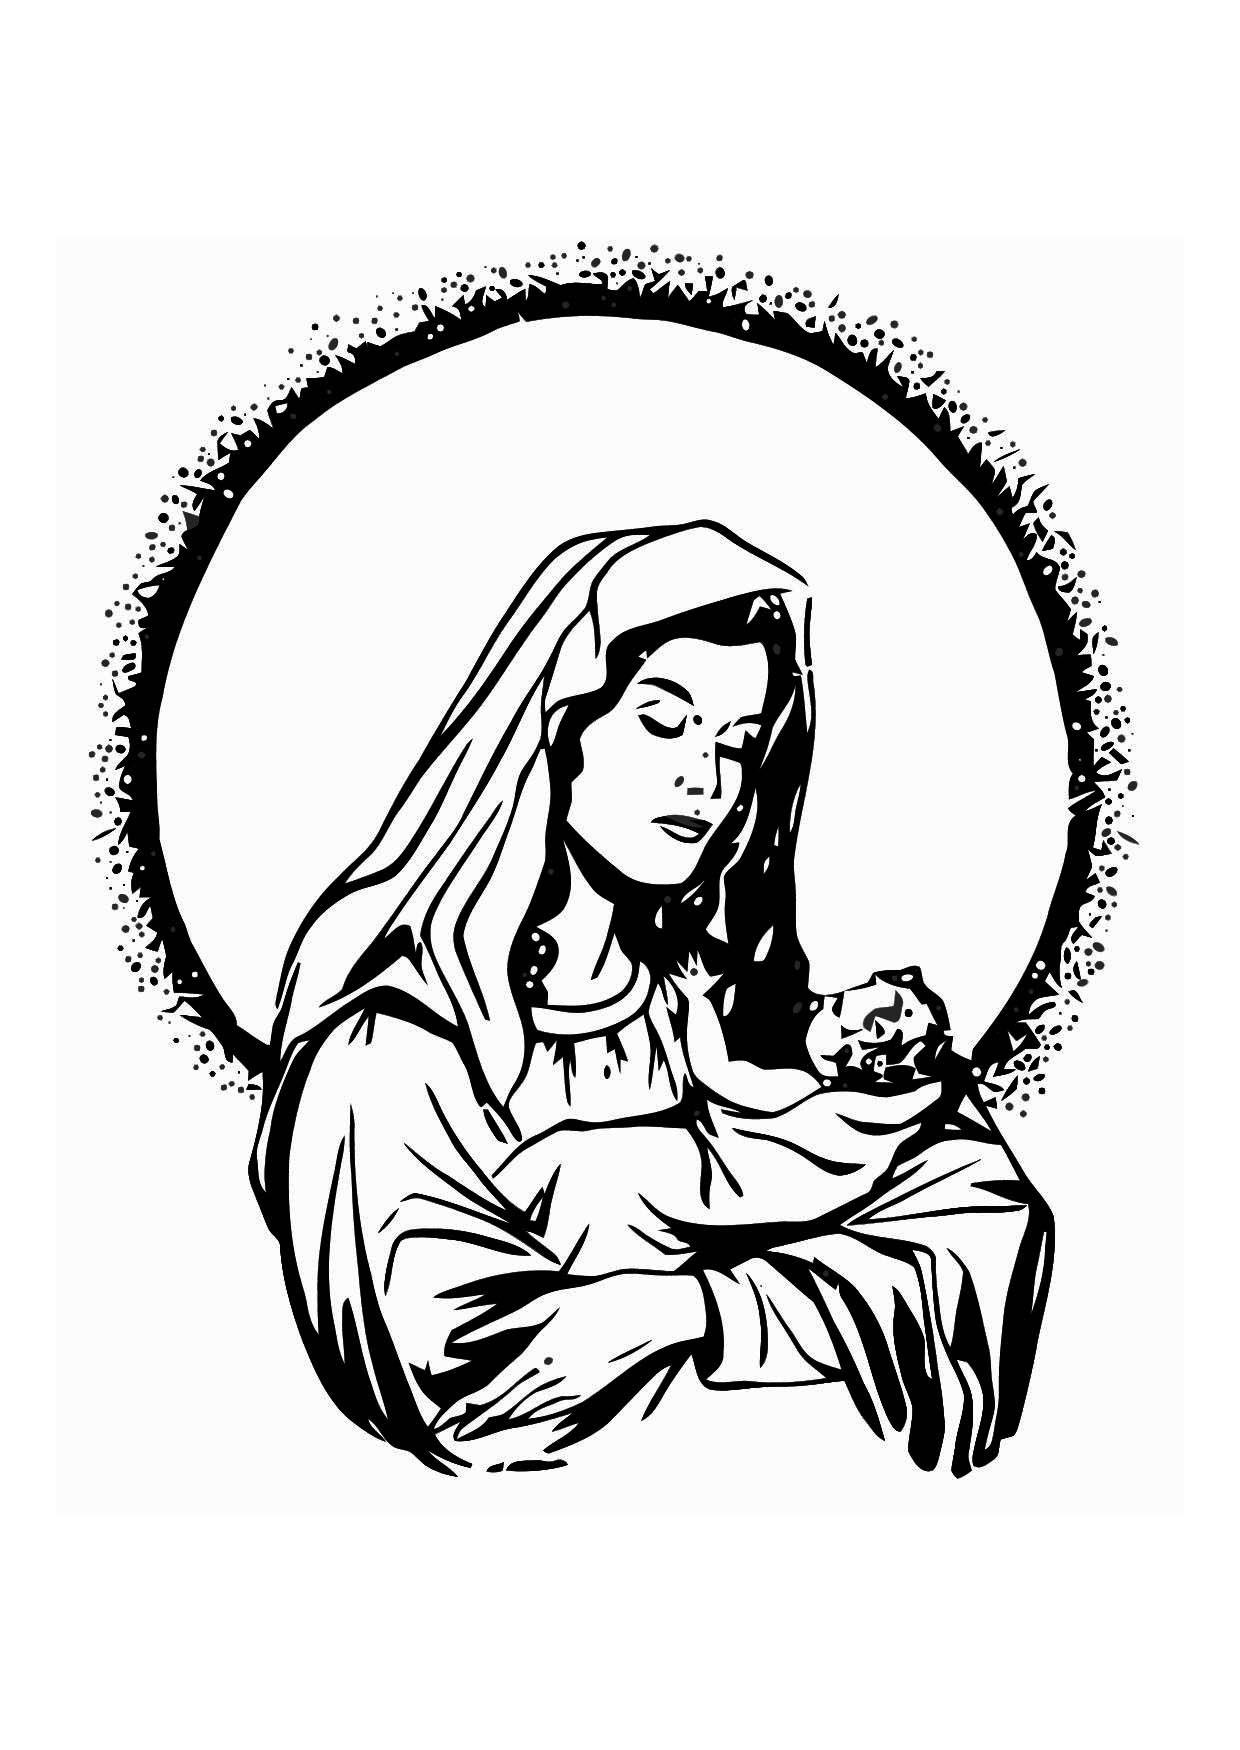 malvorlage maria und jesus ausmalbild 11407. Black Bedroom Furniture Sets. Home Design Ideas